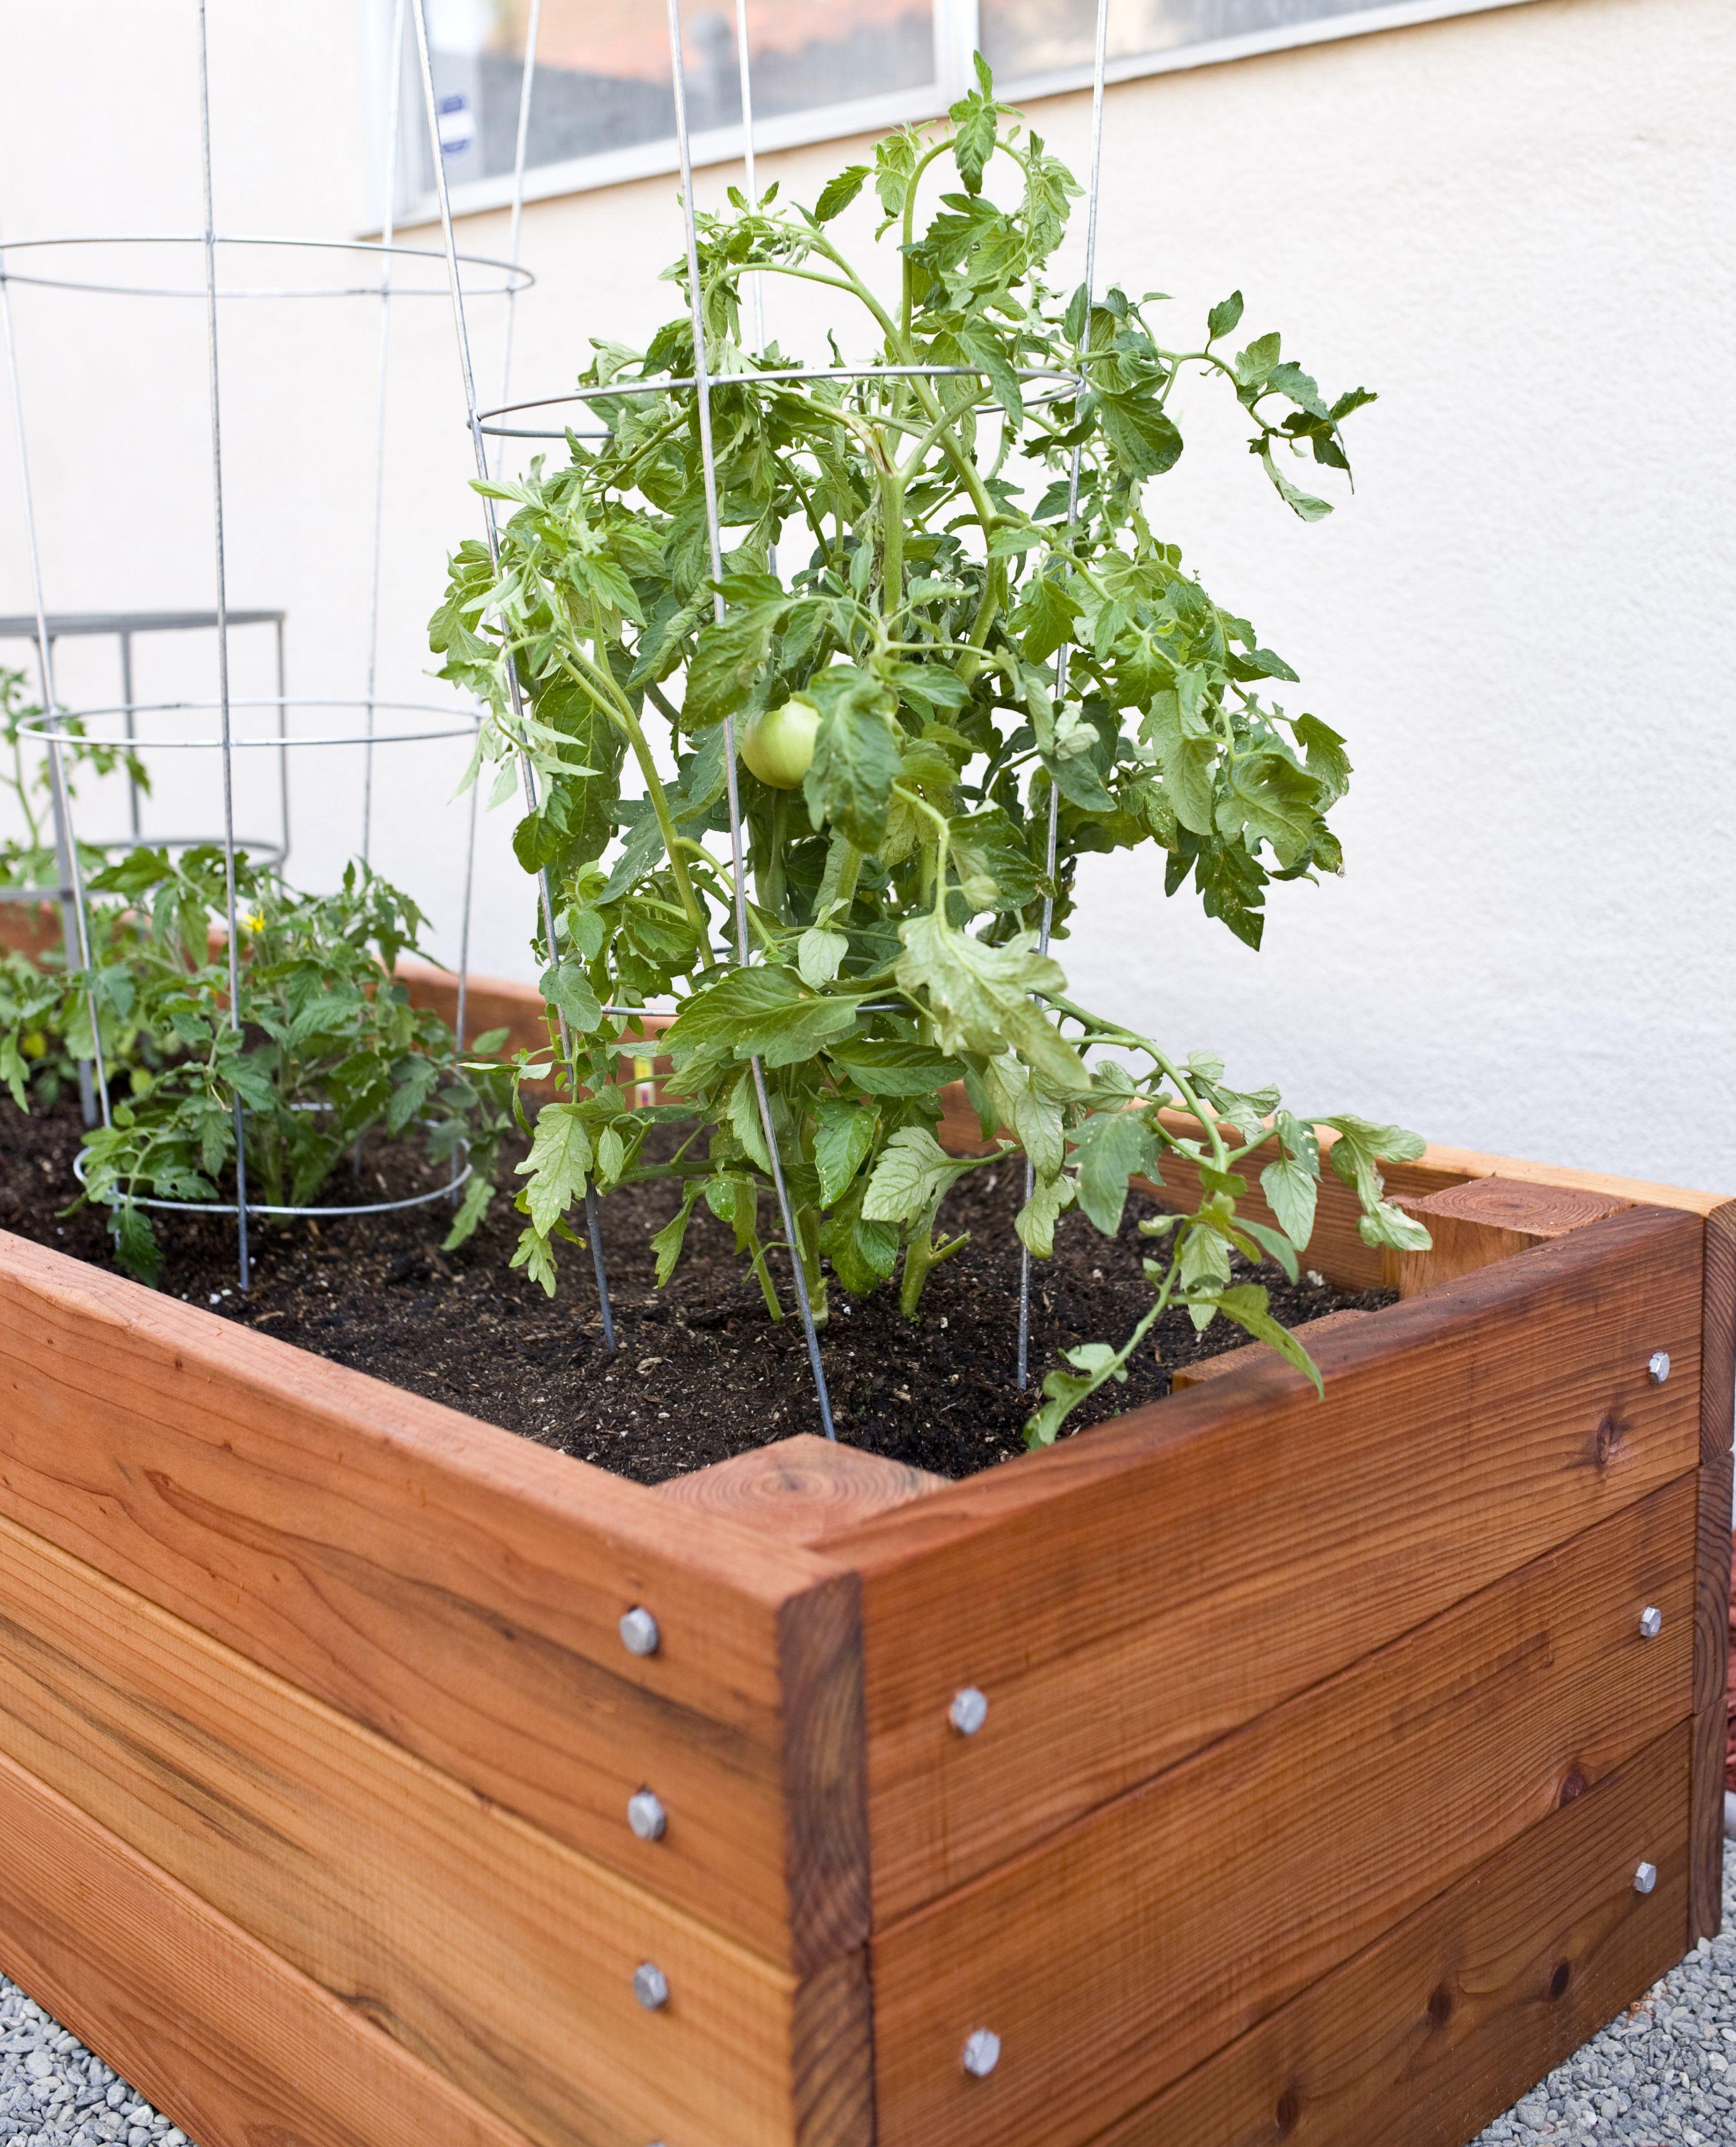 Large Redwood Planter Box for Tomatoes Redwood planter